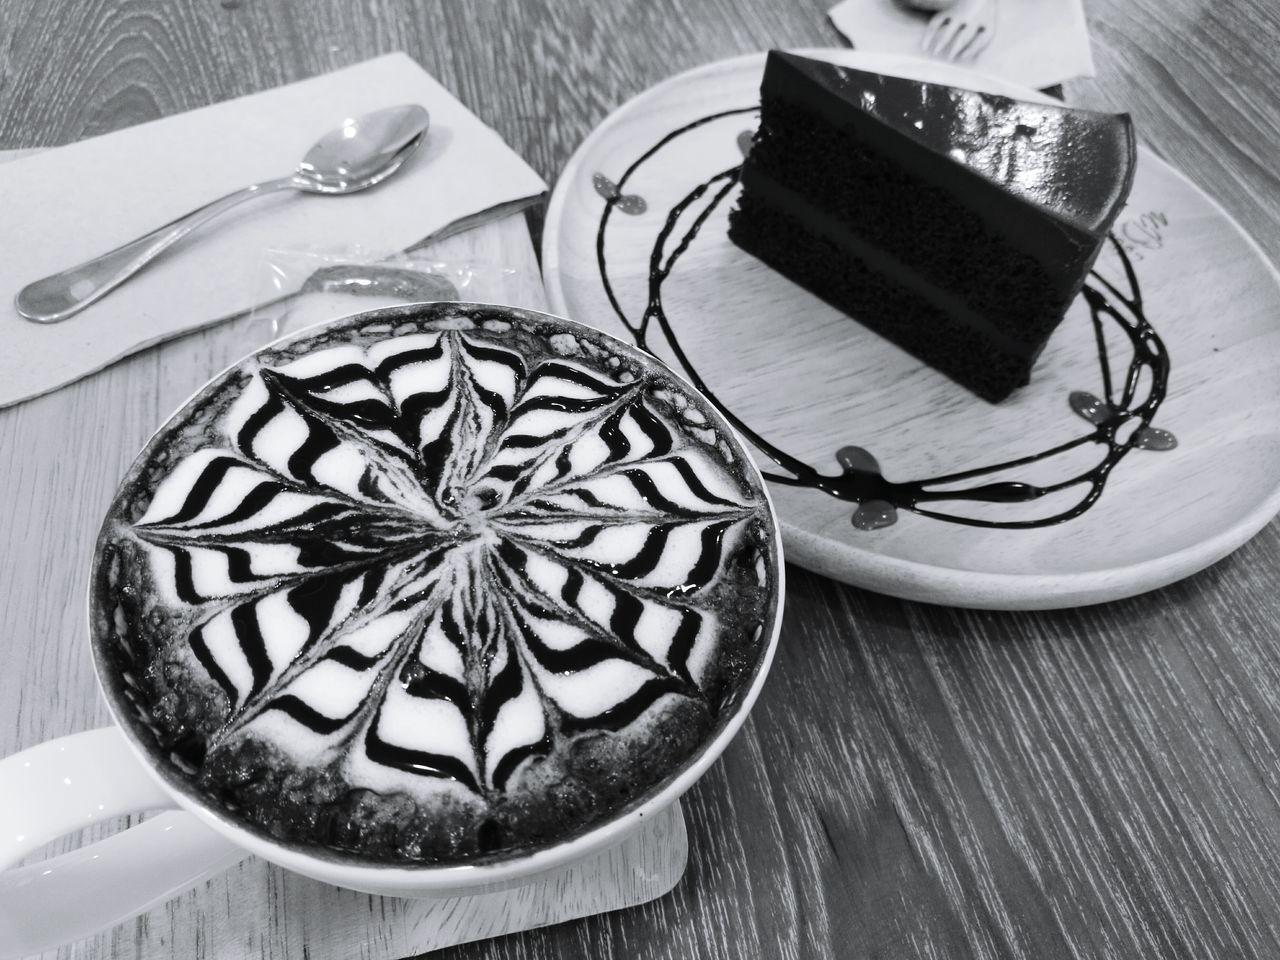 SLICE Sweet Food Table Slice Of Cake No People Chocolate Chocolate Hot Cake